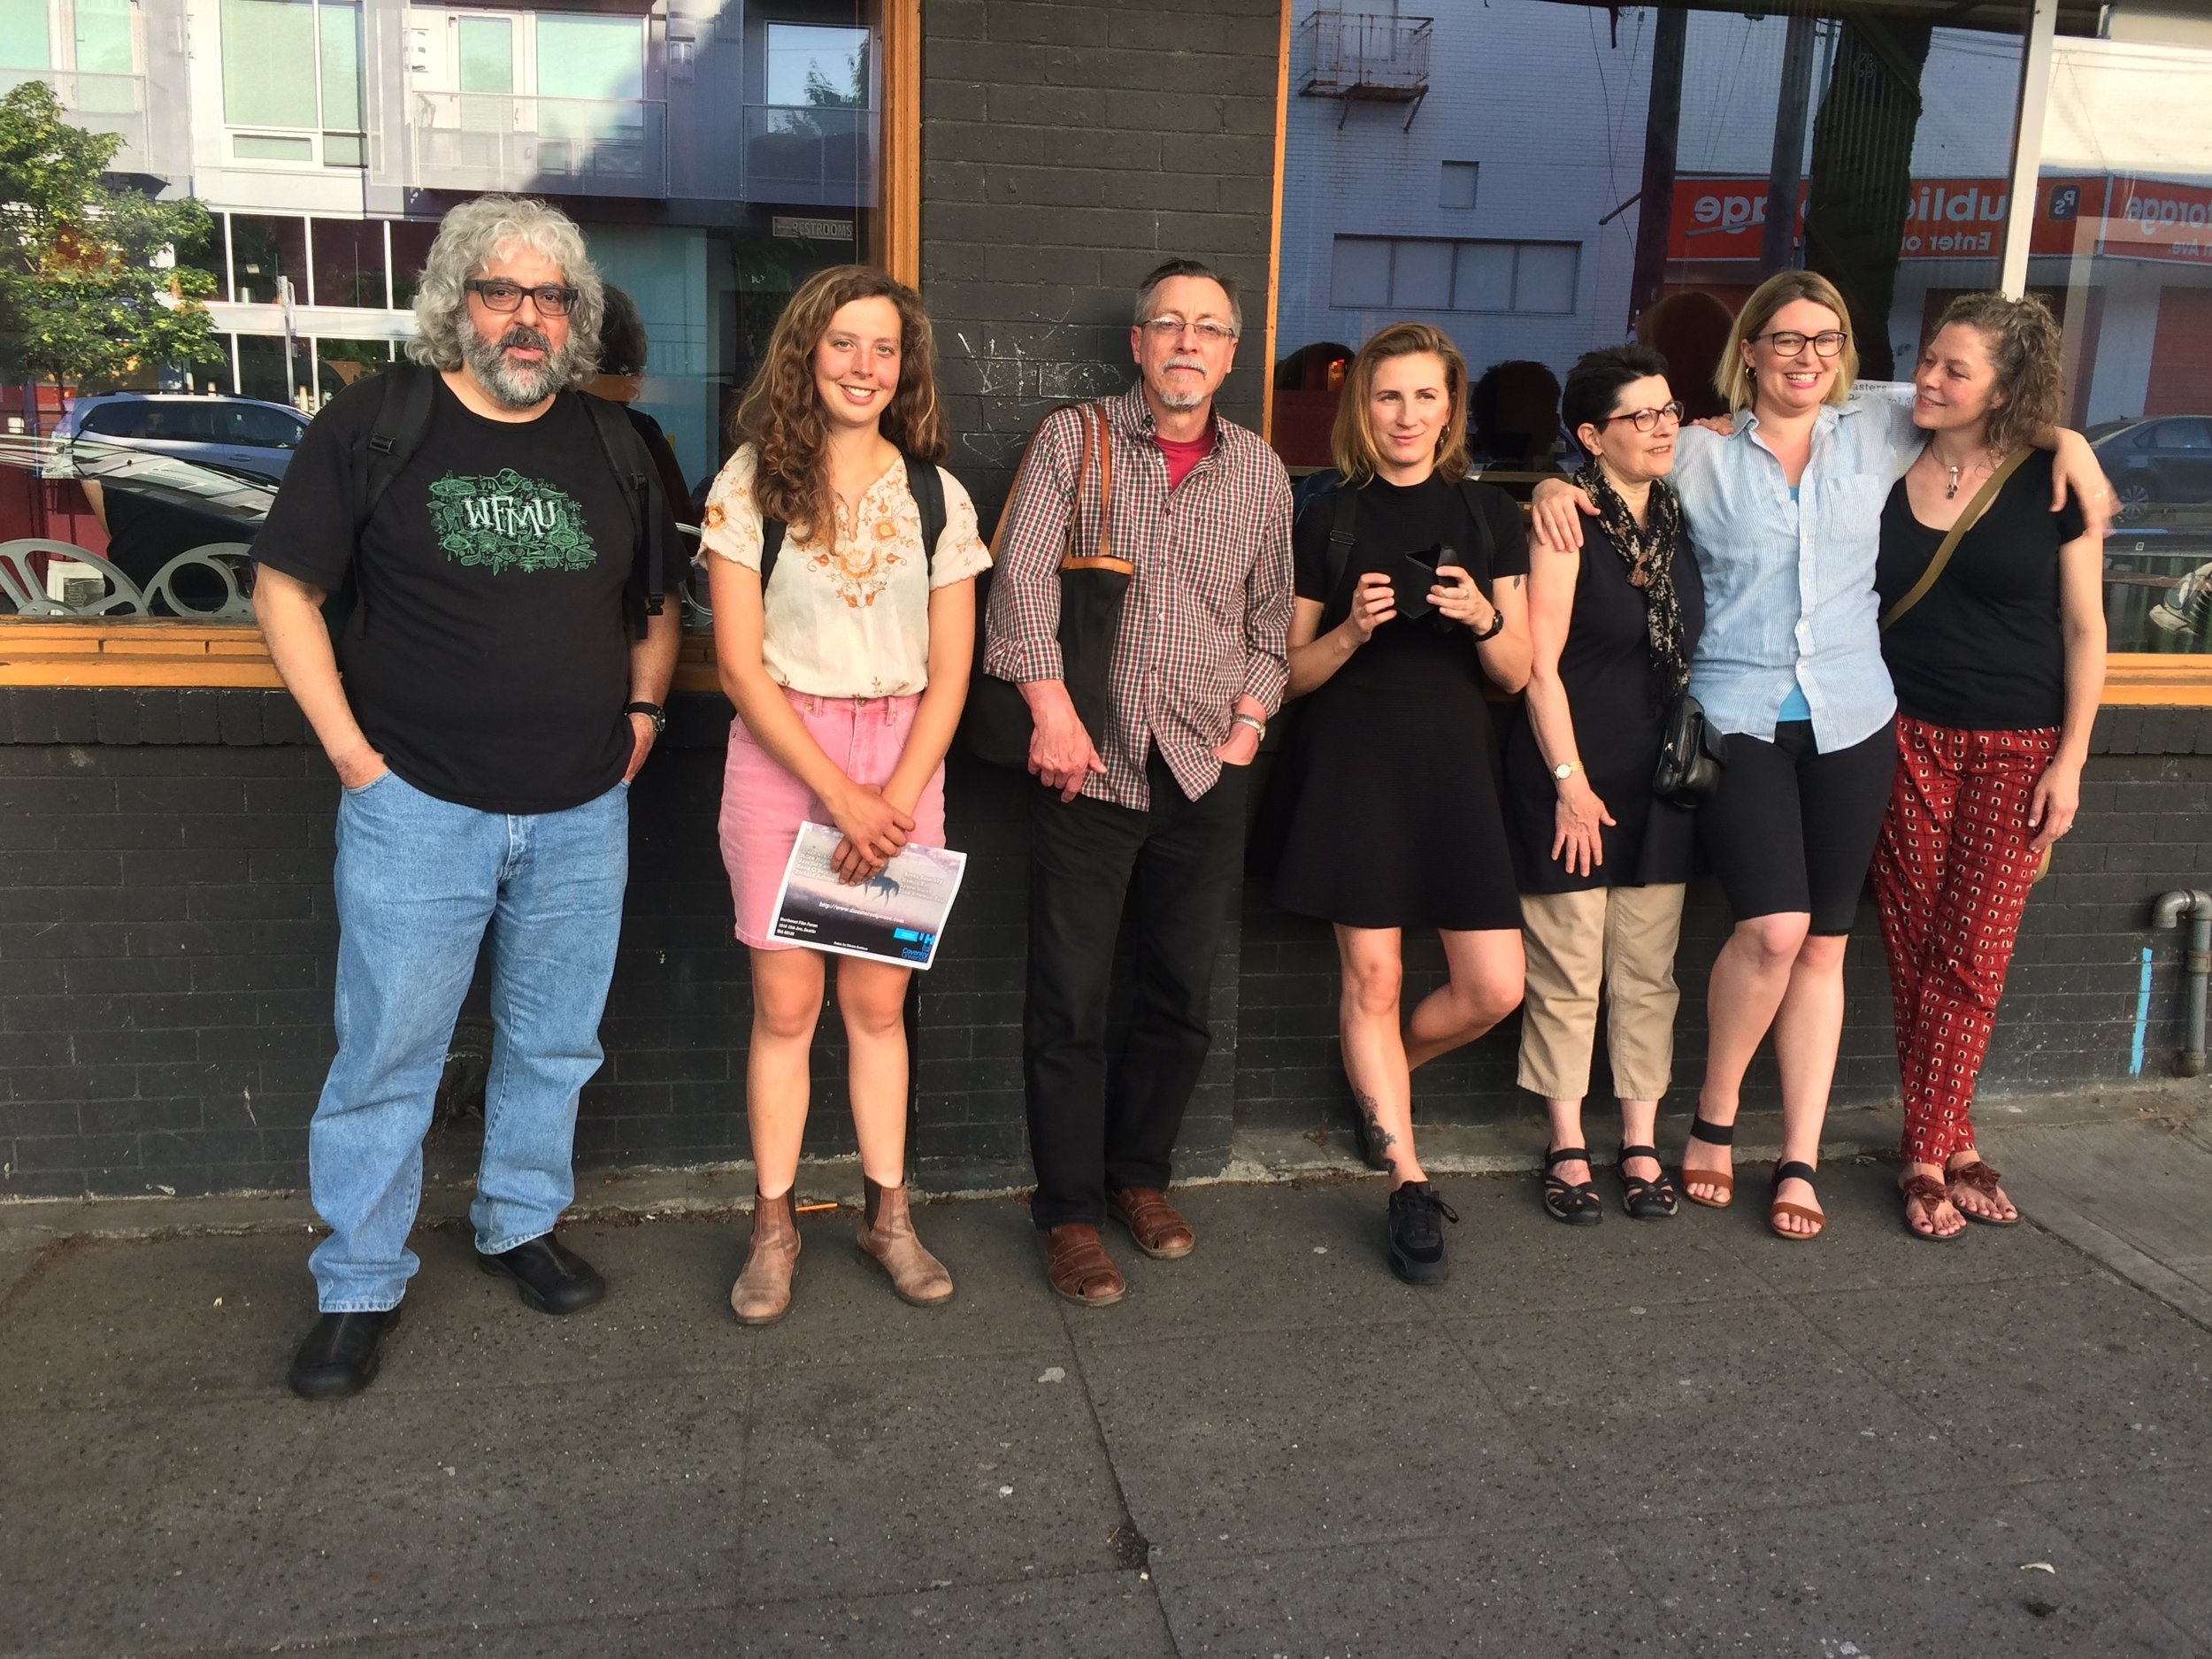 Disasters of Peace vol.3, Northwest Film Forum, Seattle, WA, with Steve Demas, Linda Fenstermaker, Dan Greenblatt, Caryn Cline, Johanna Gosse and Holly Deye de Vega